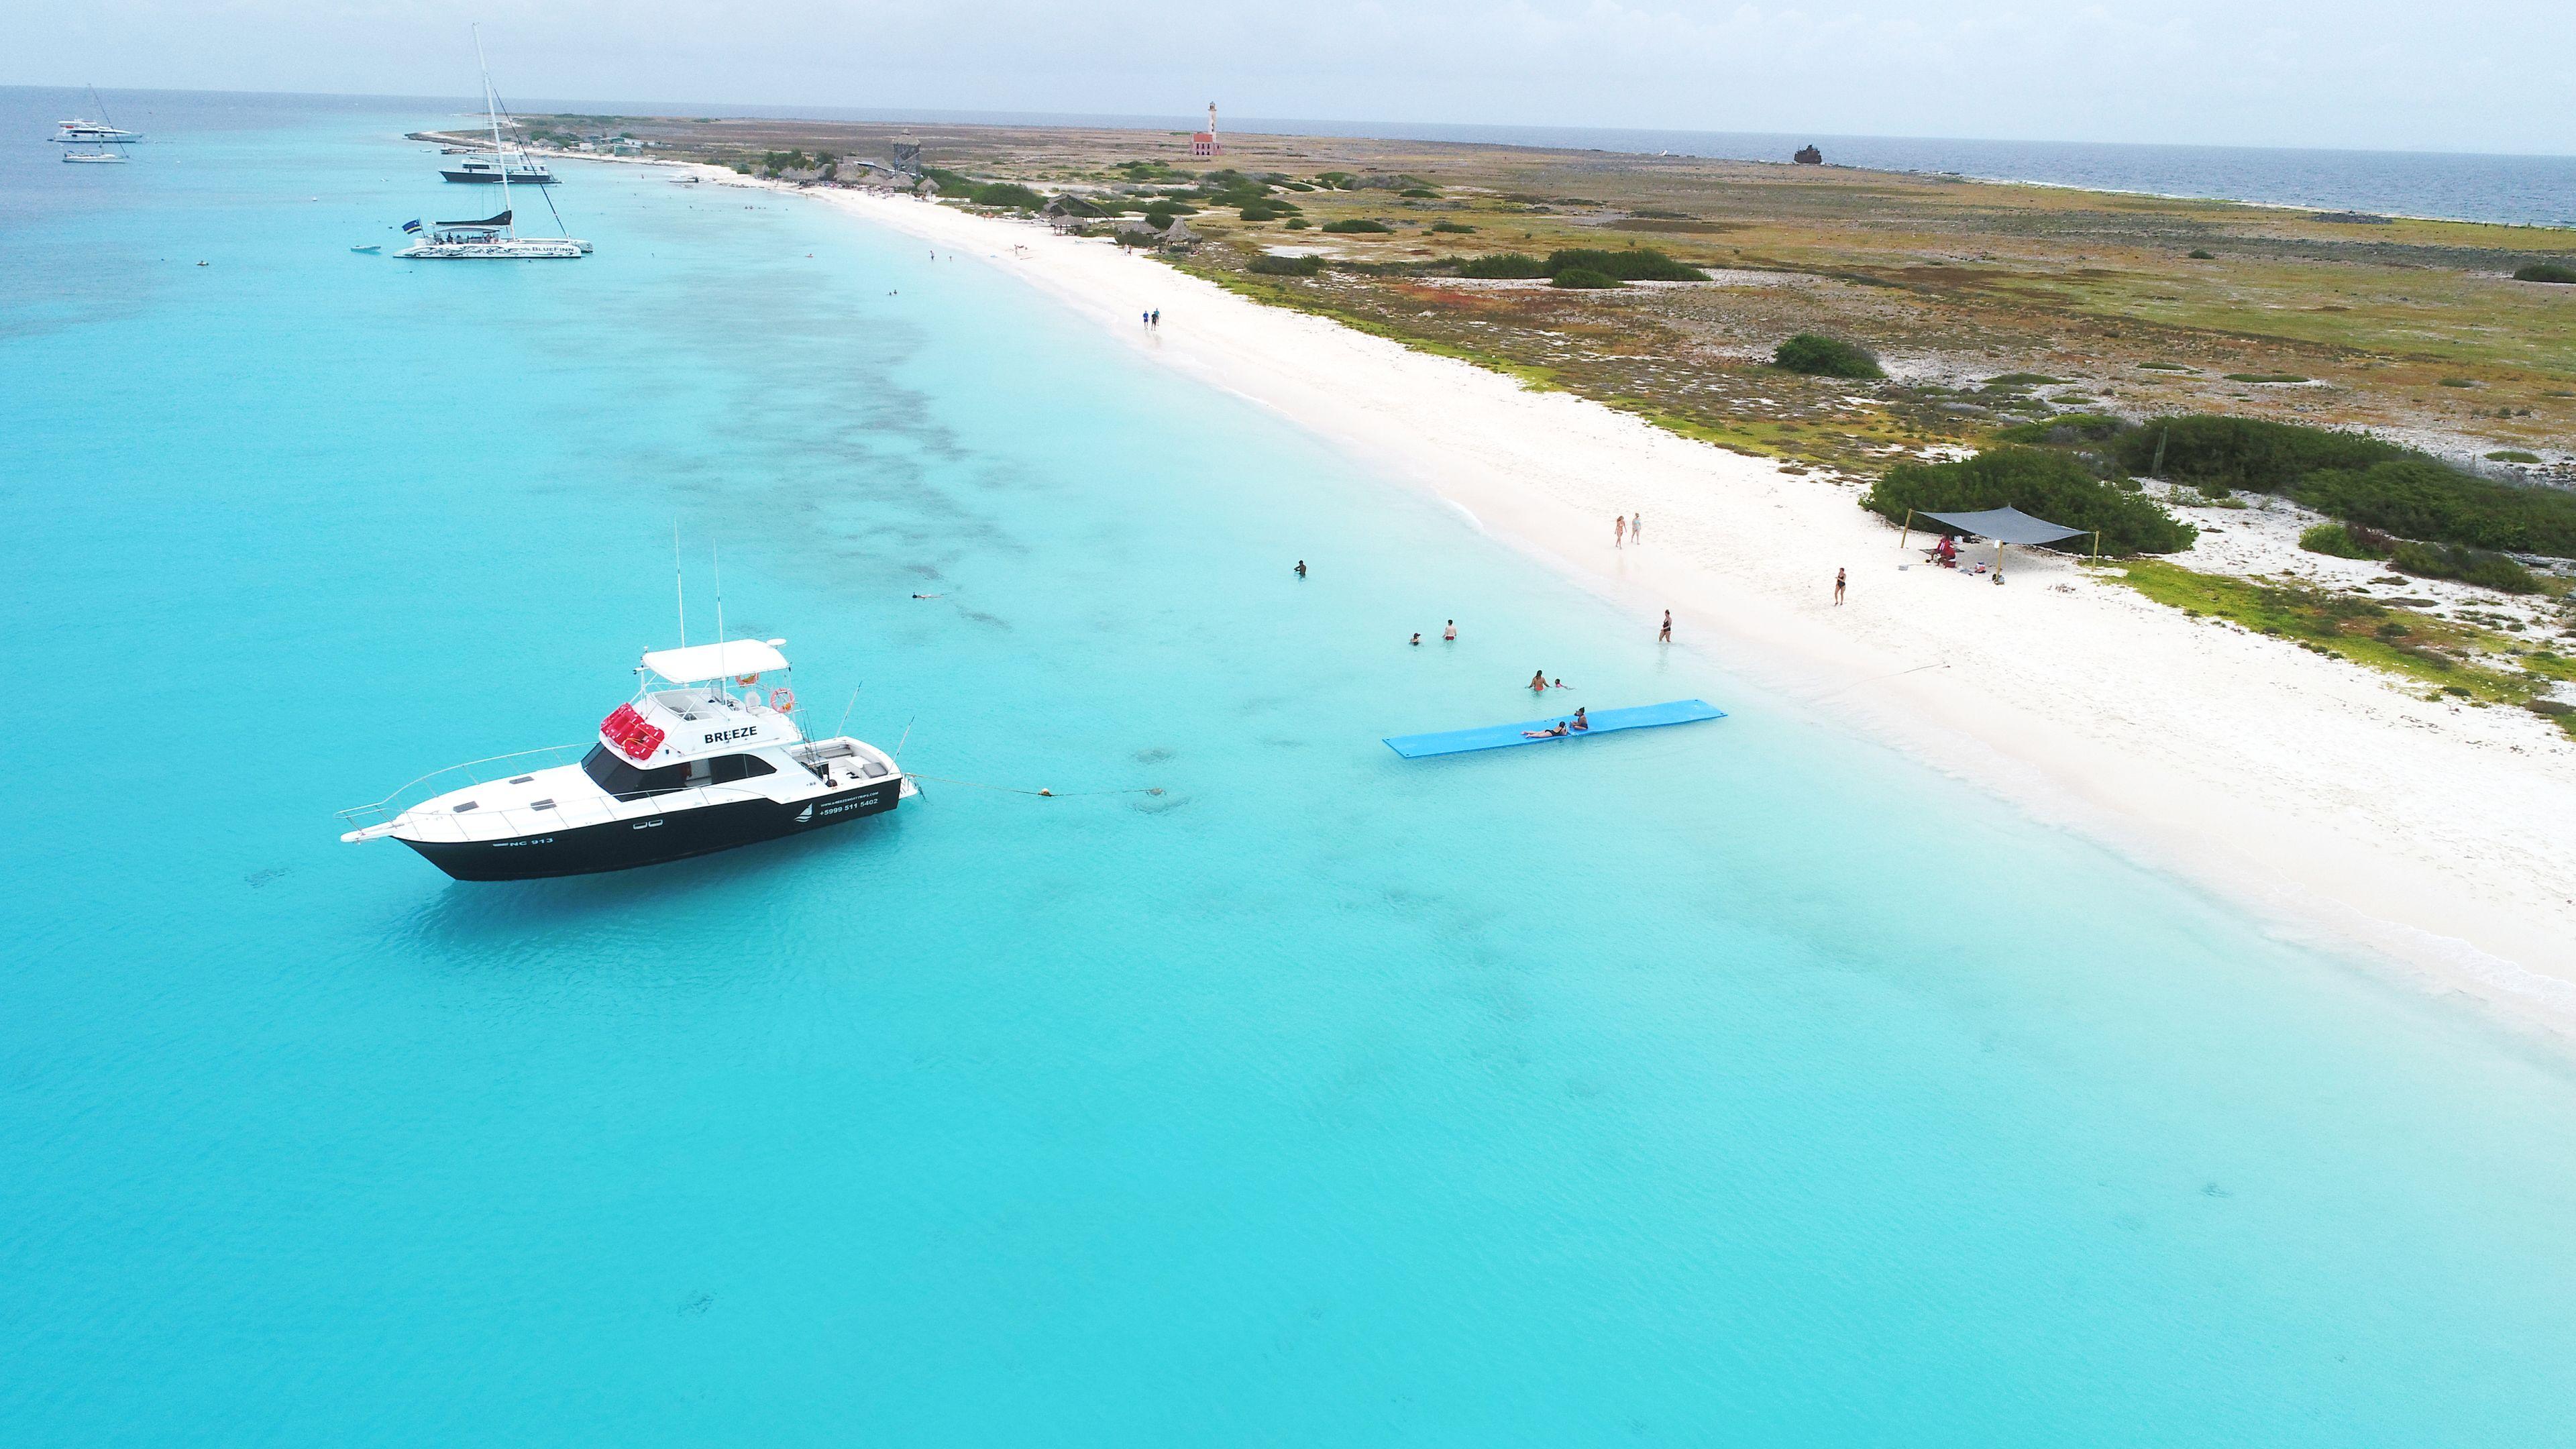 Breeze Adventures Klein Curacao Boat Trip